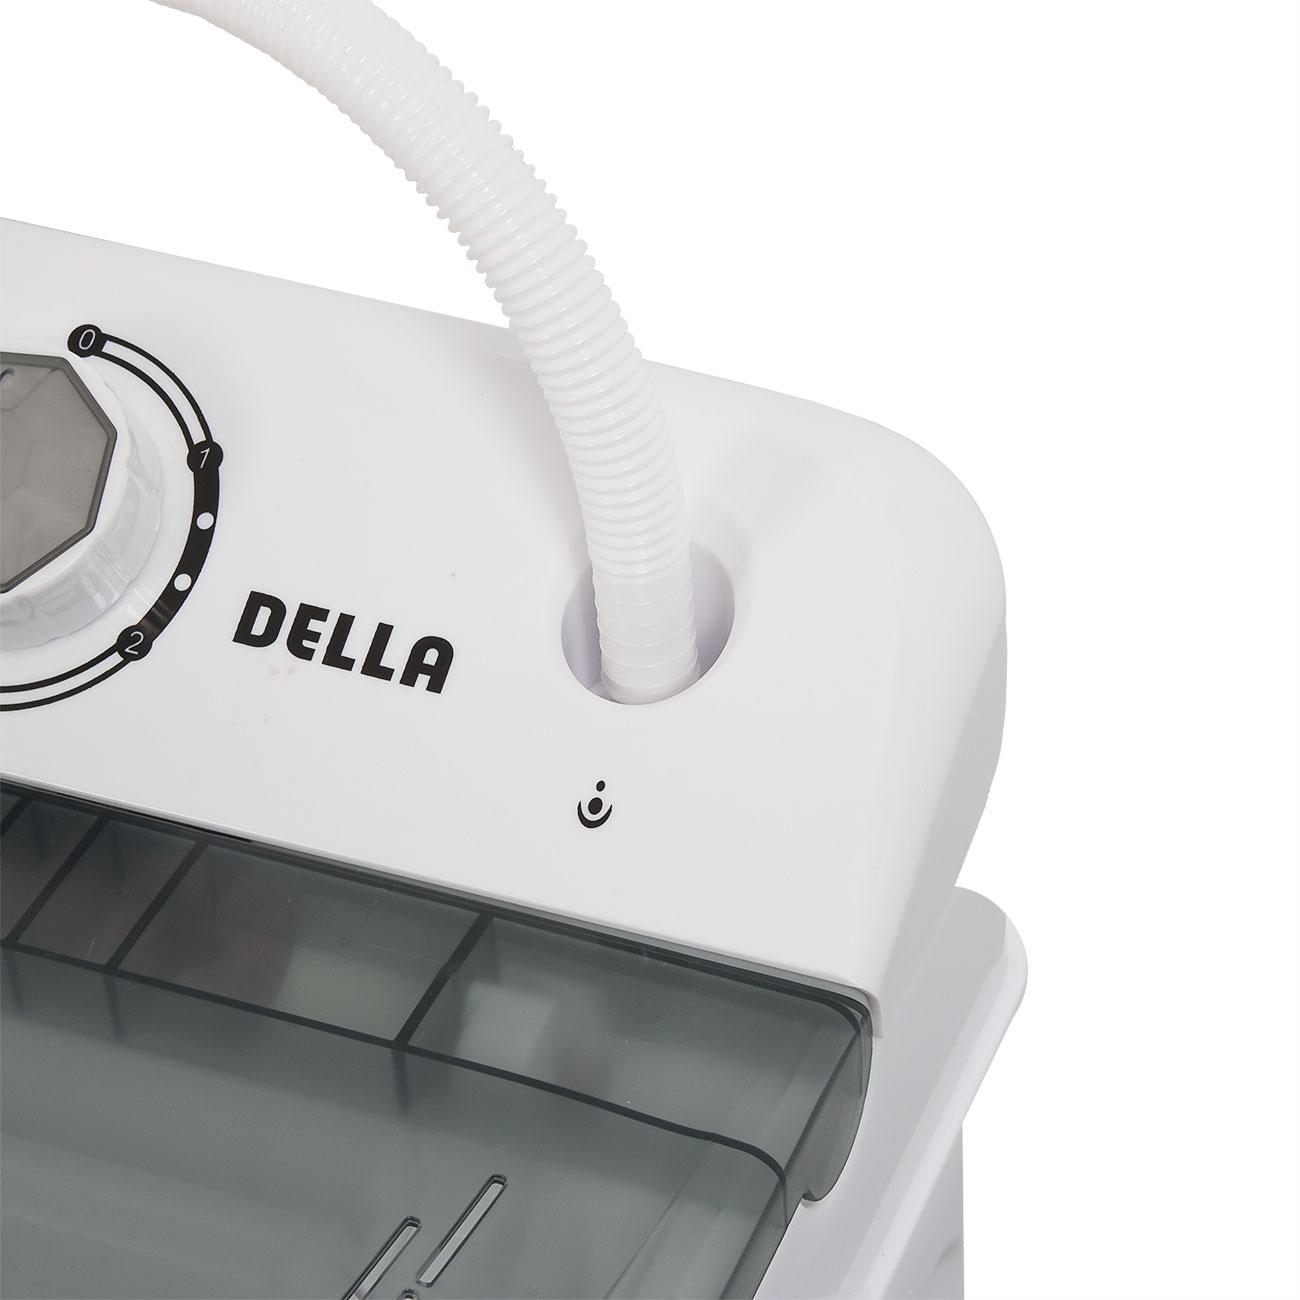 Portable Electric Washing Machine 5KG Dual Wash Spin U0026 Dryer Twin Tub Top  Load